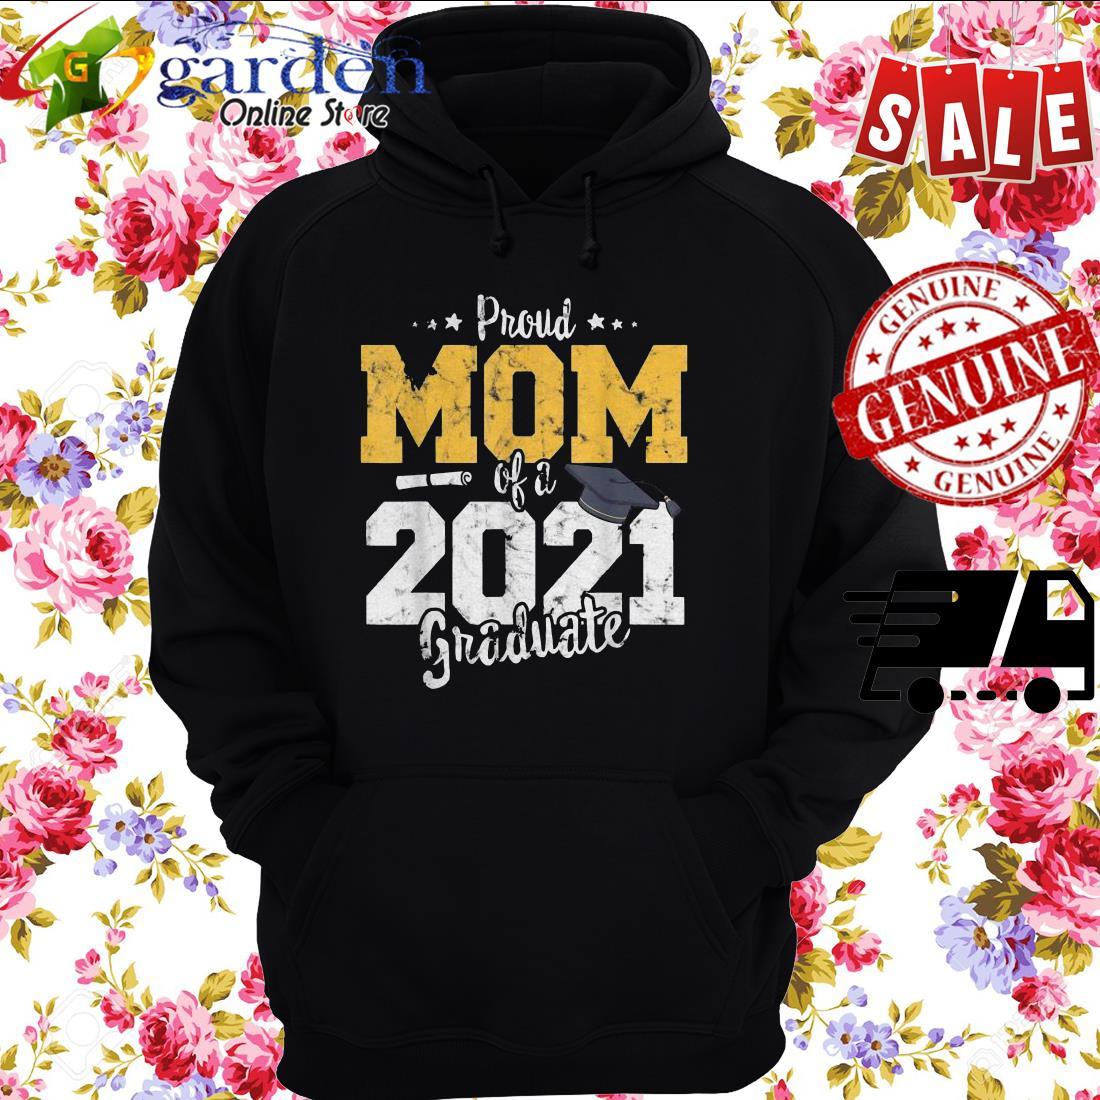 2021 Graduation mother Proud mom of 2021 graduate hoodie